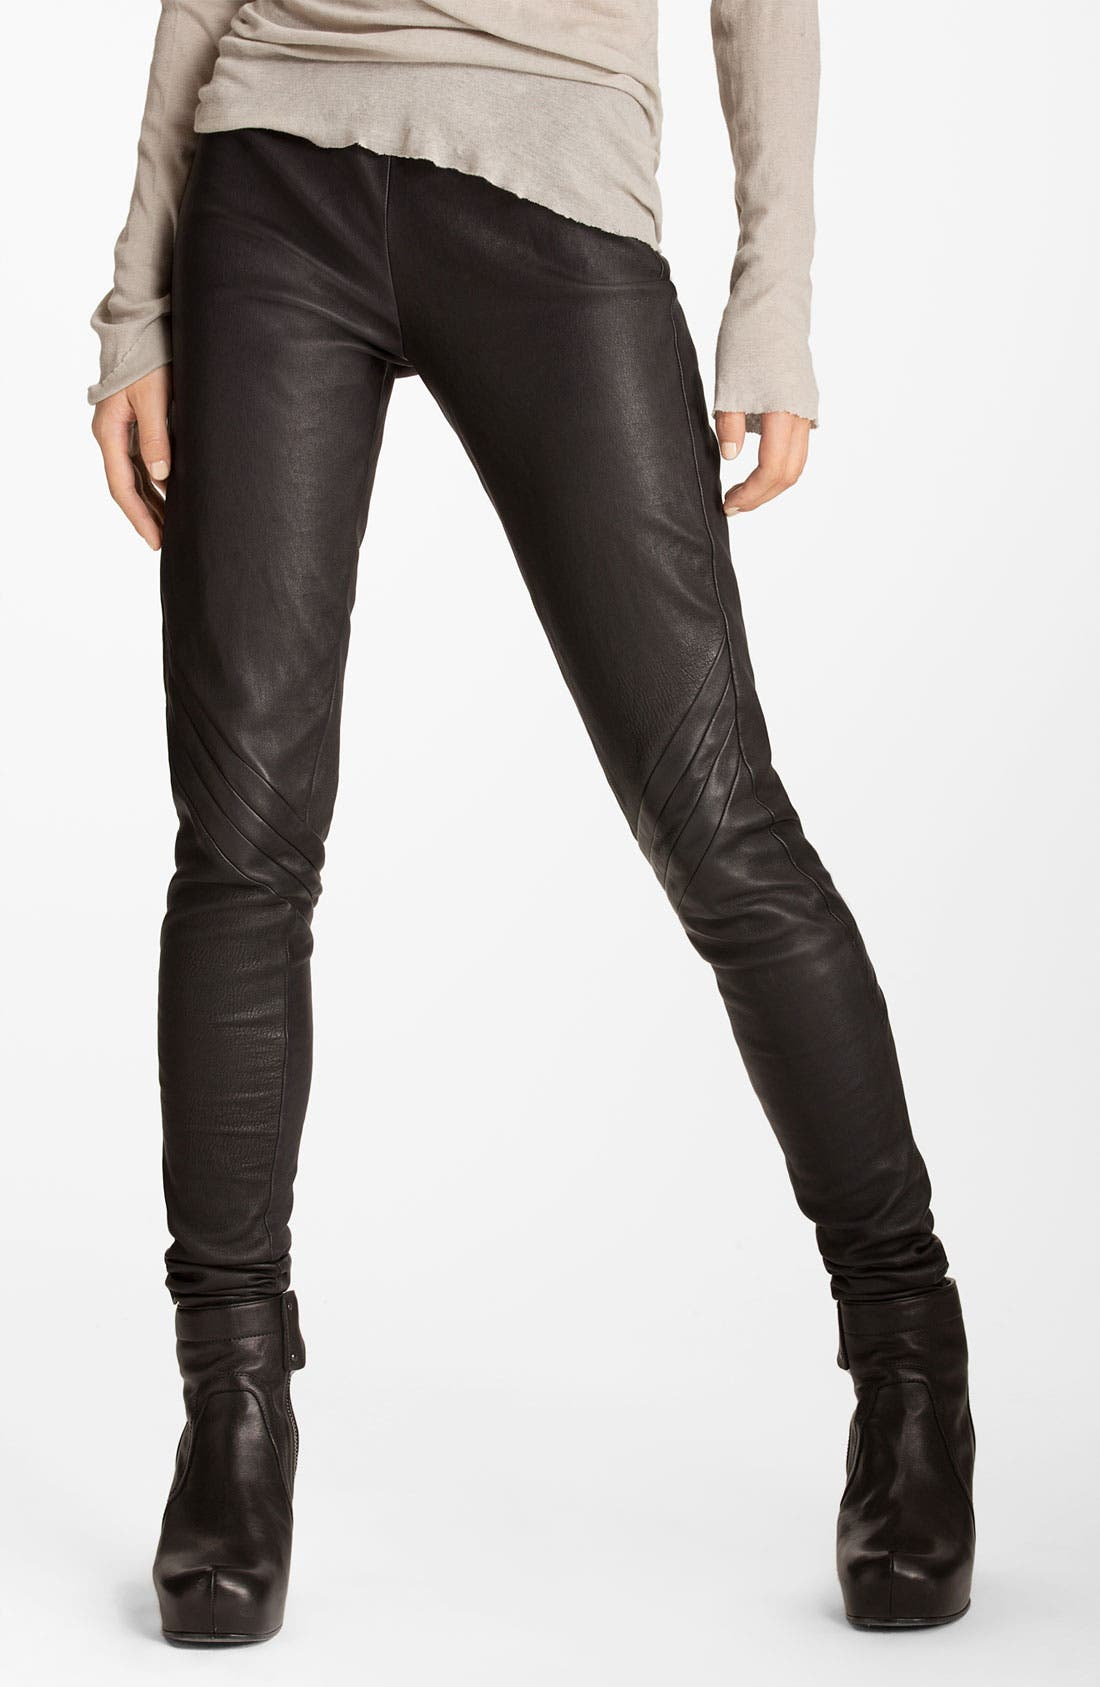 Main Image - Rick Owens Leather Leggings